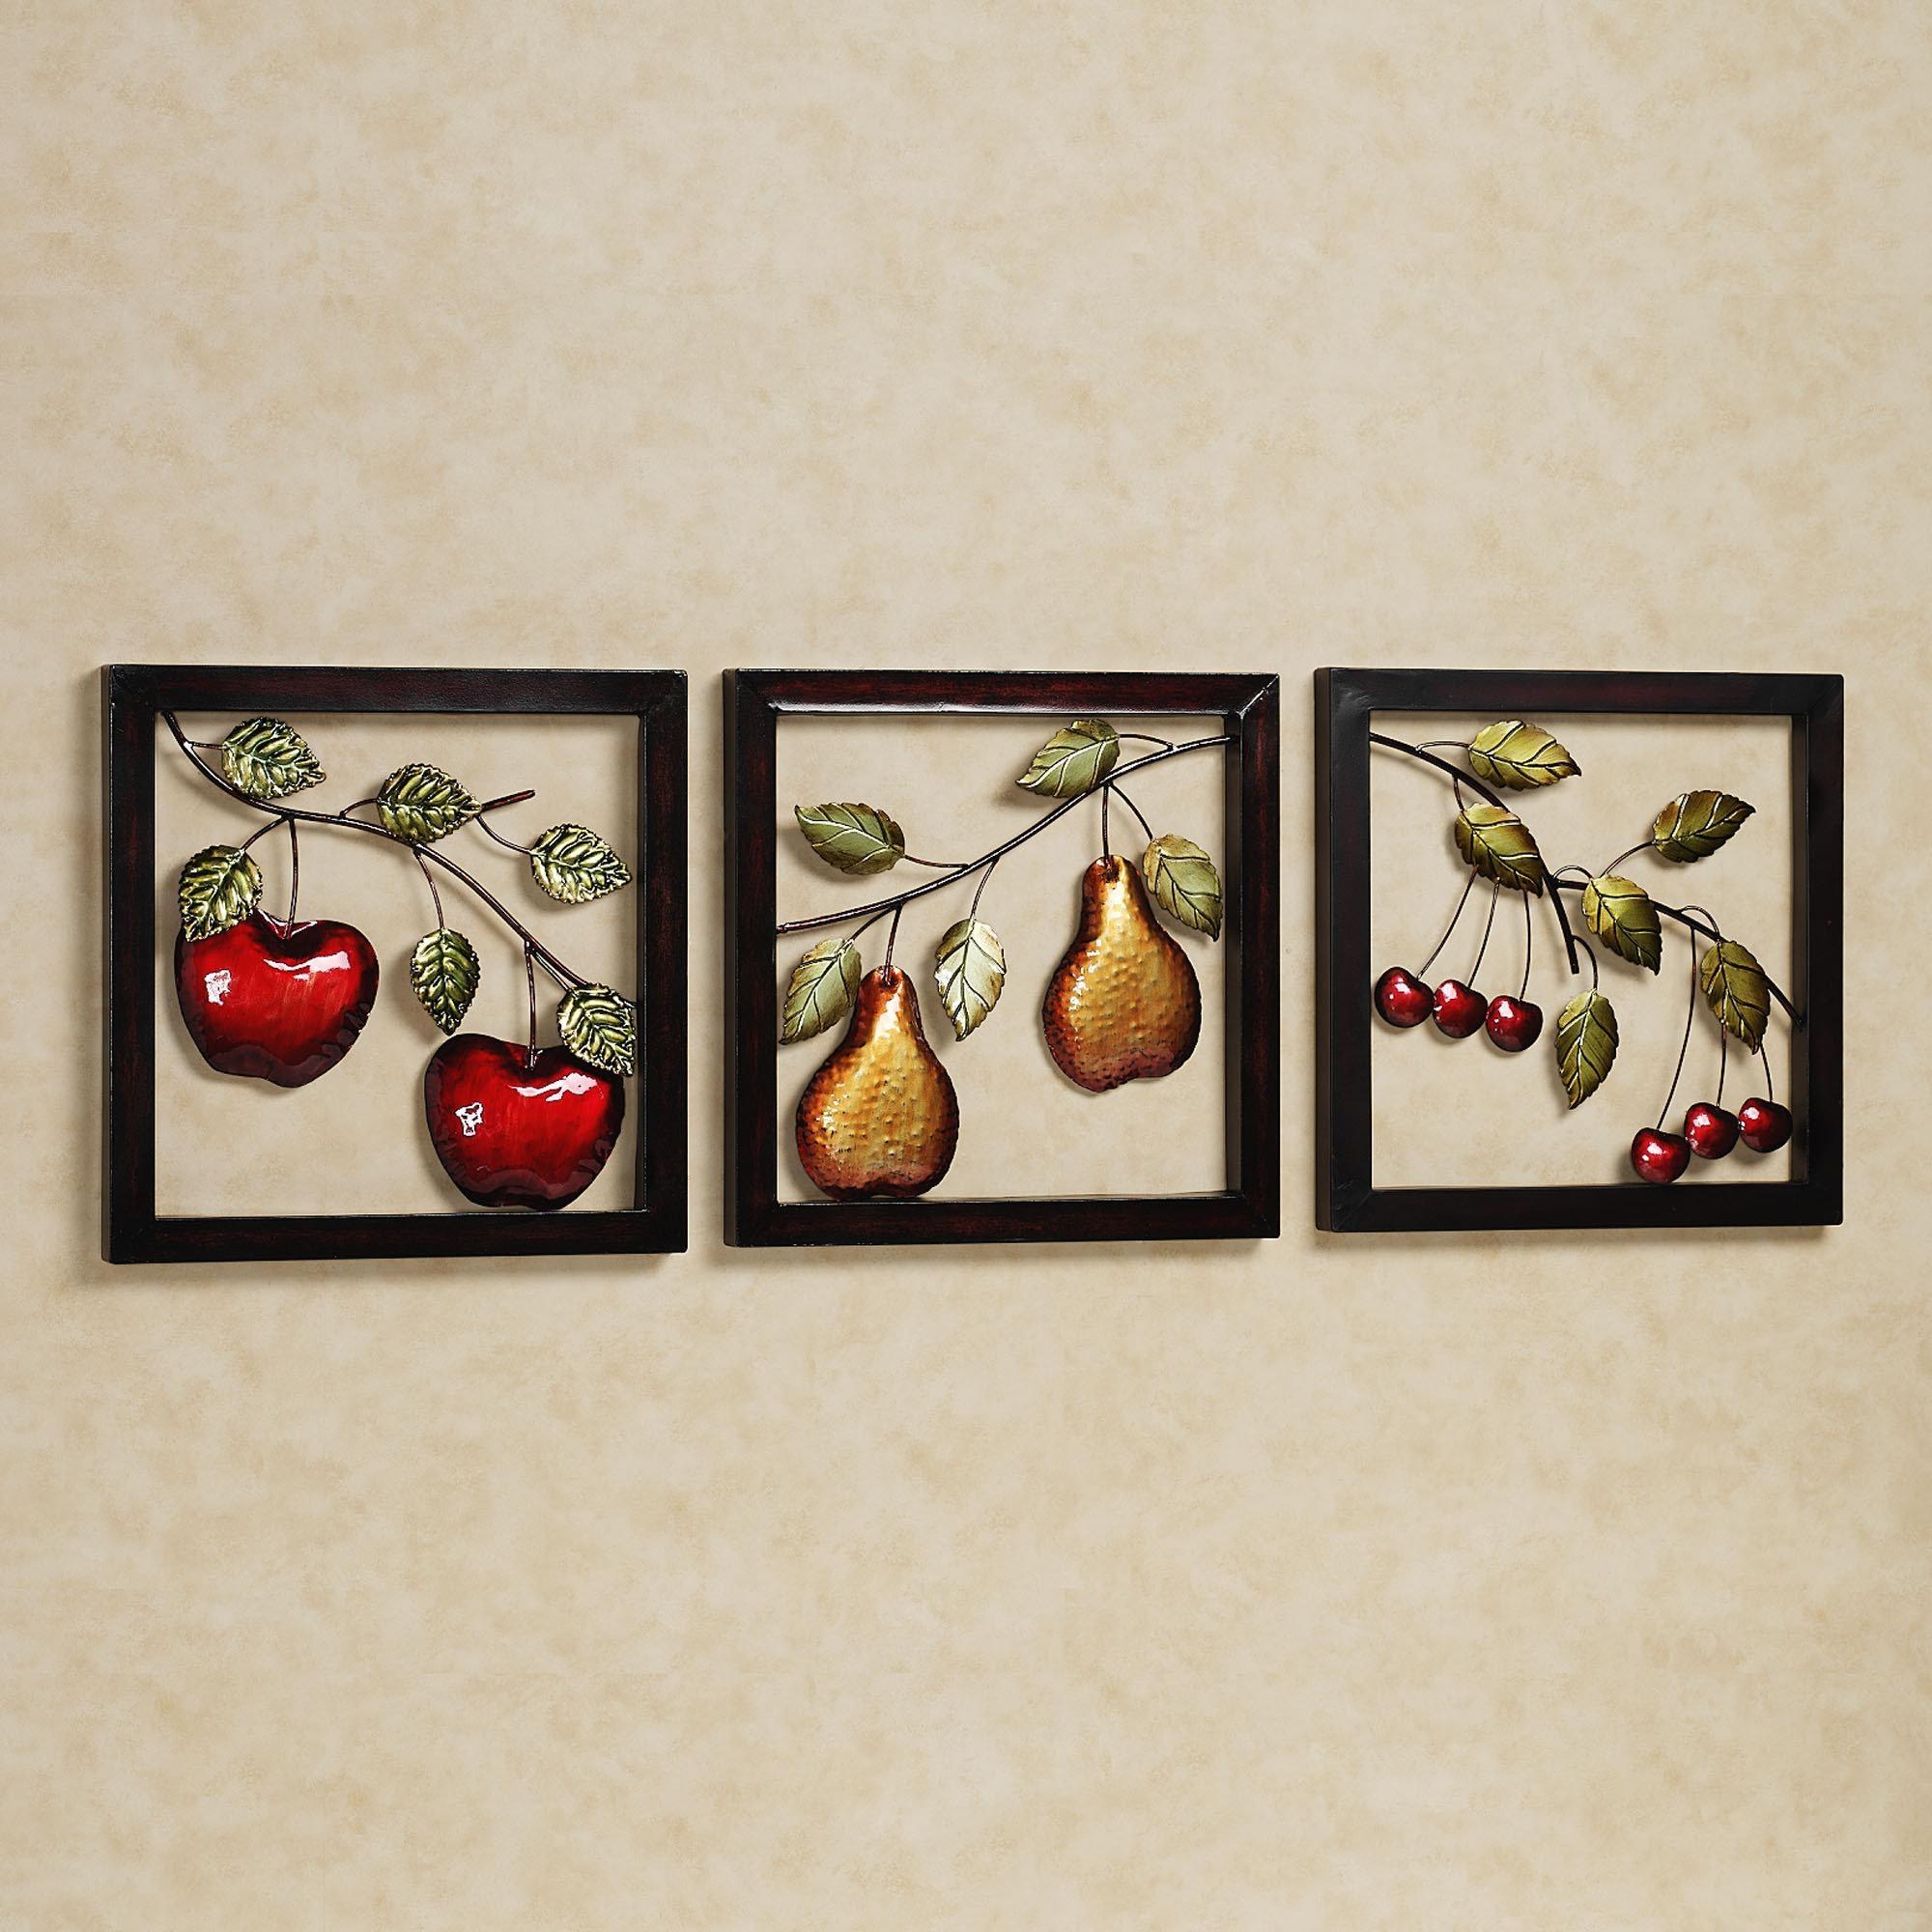 Kitchen Metal Wall Art Decor | Gen4Congress With Regard To Metal Framed Wall Art (Image 11 of 20)